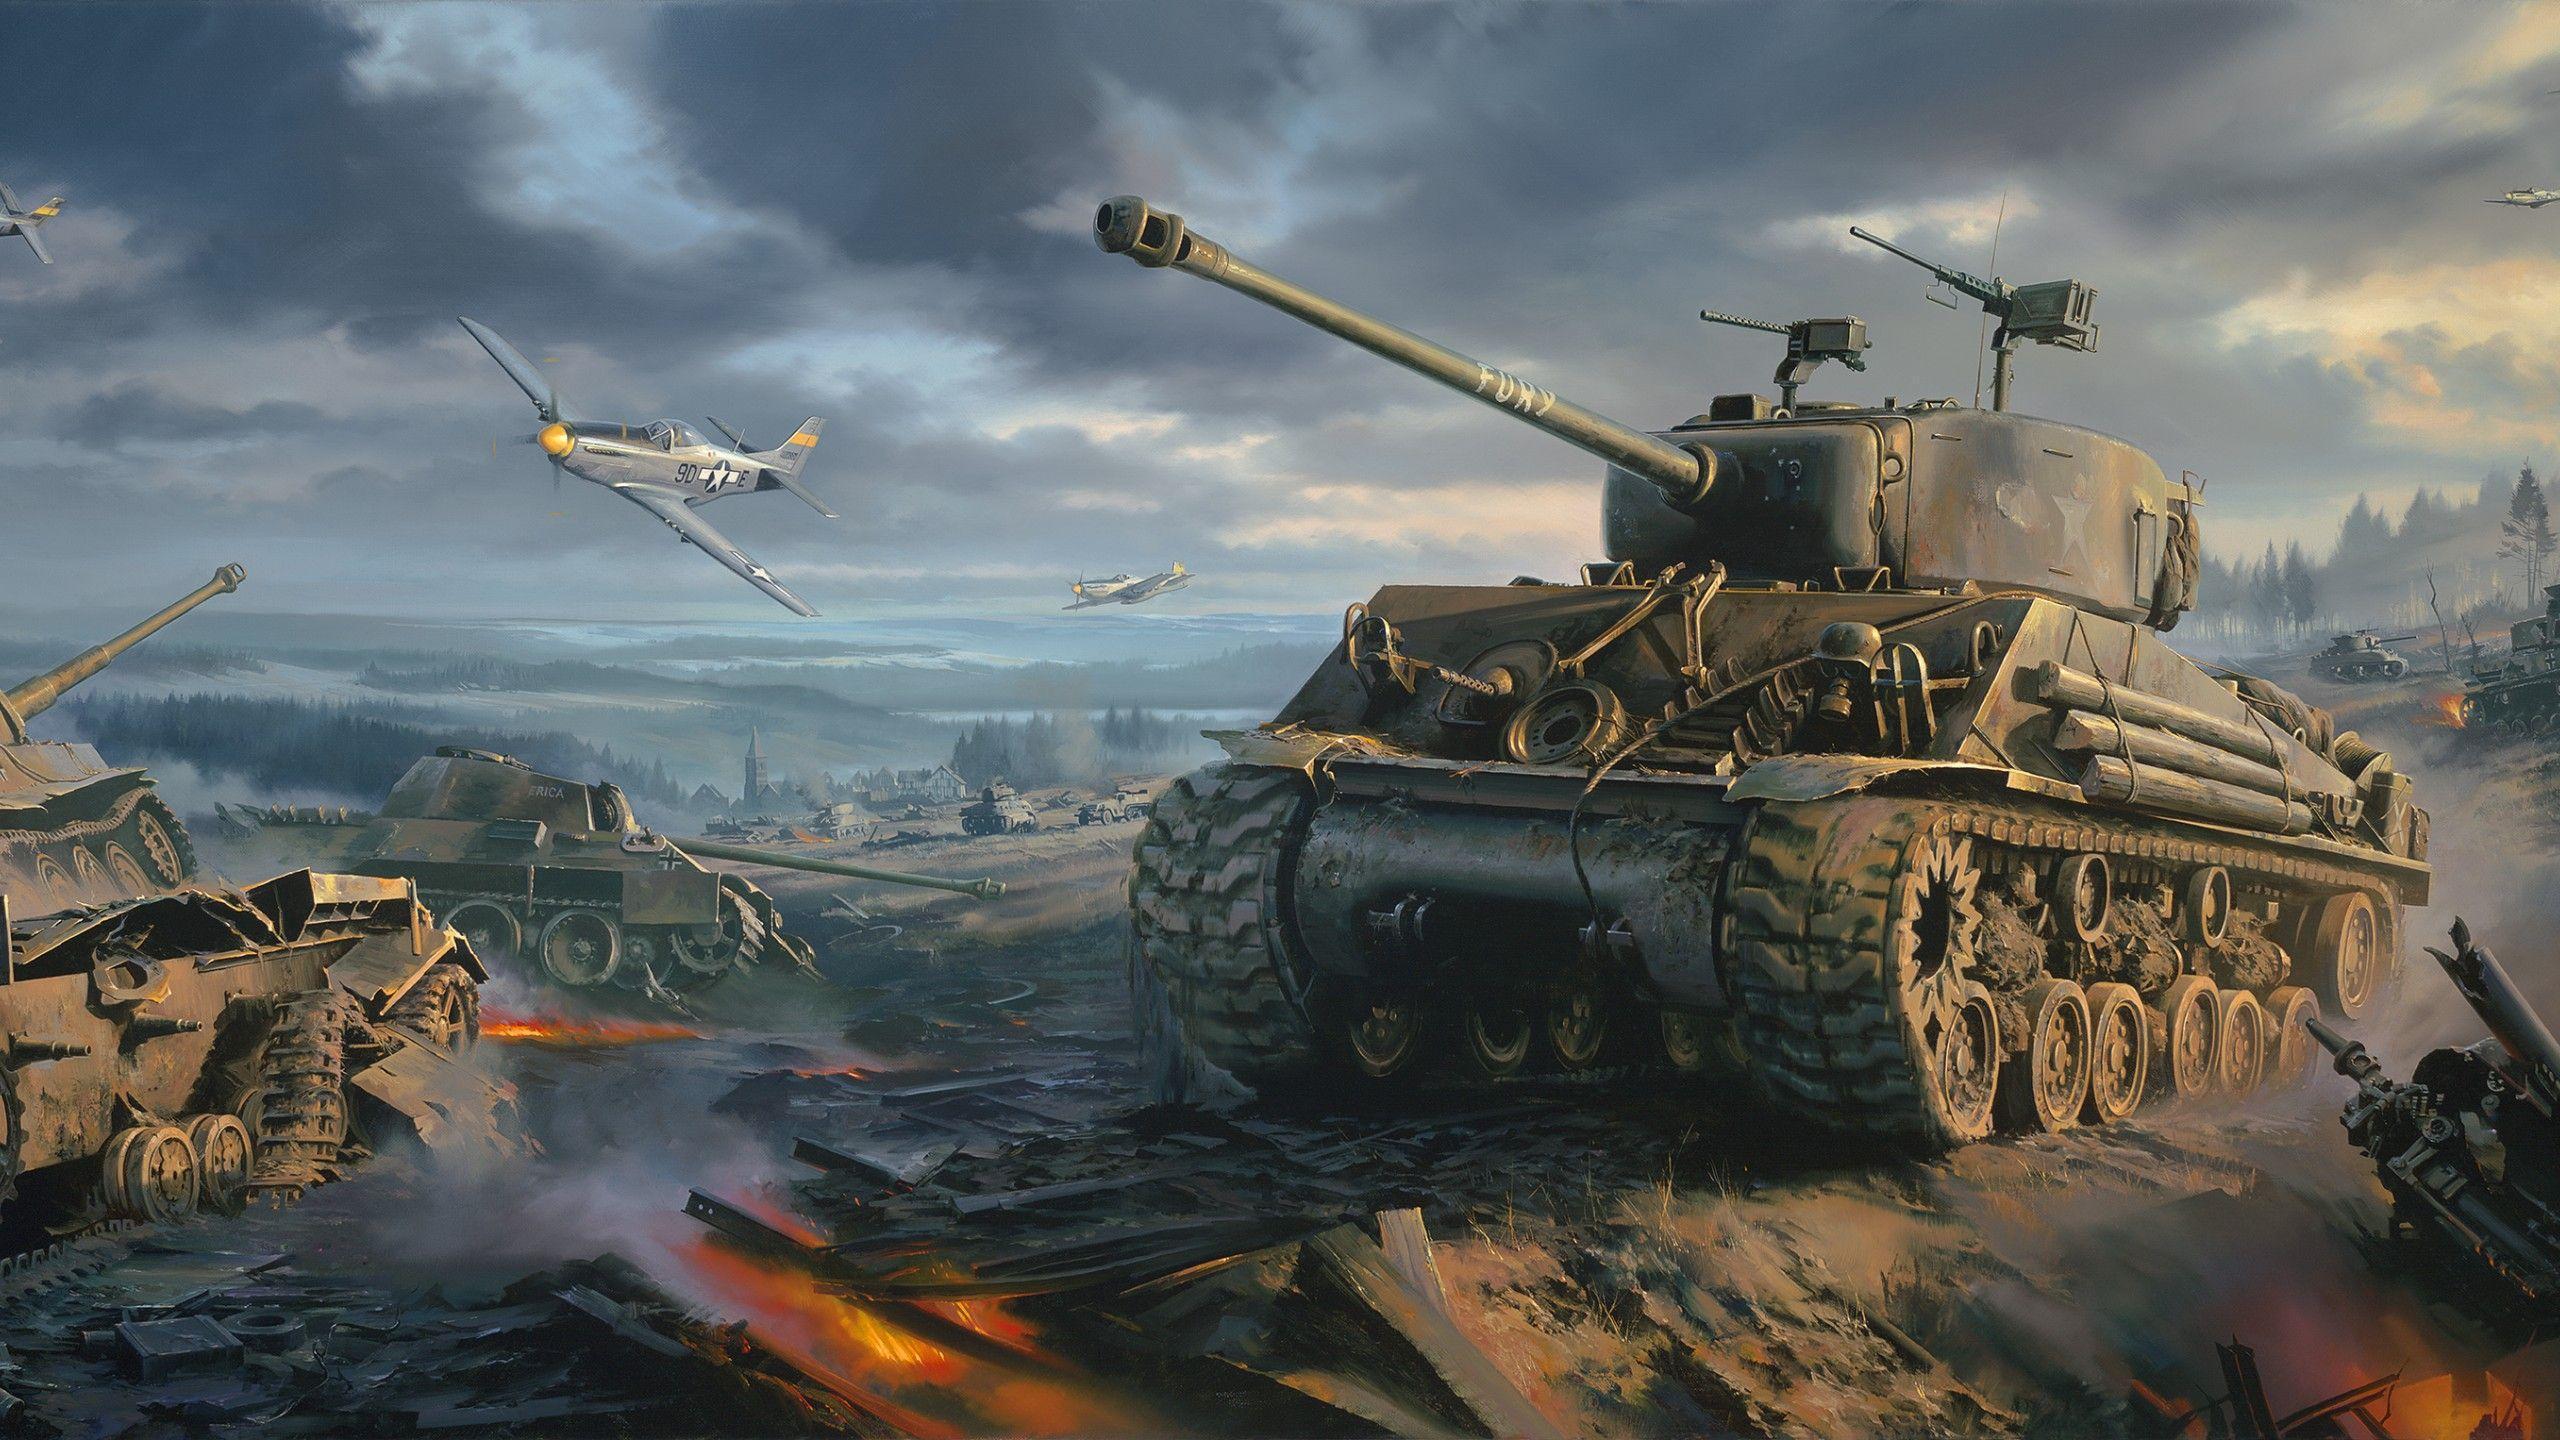 WW2 Tank Wallpapers   Top WW2 Tank Backgrounds   WallpaperAccess 2560x1440